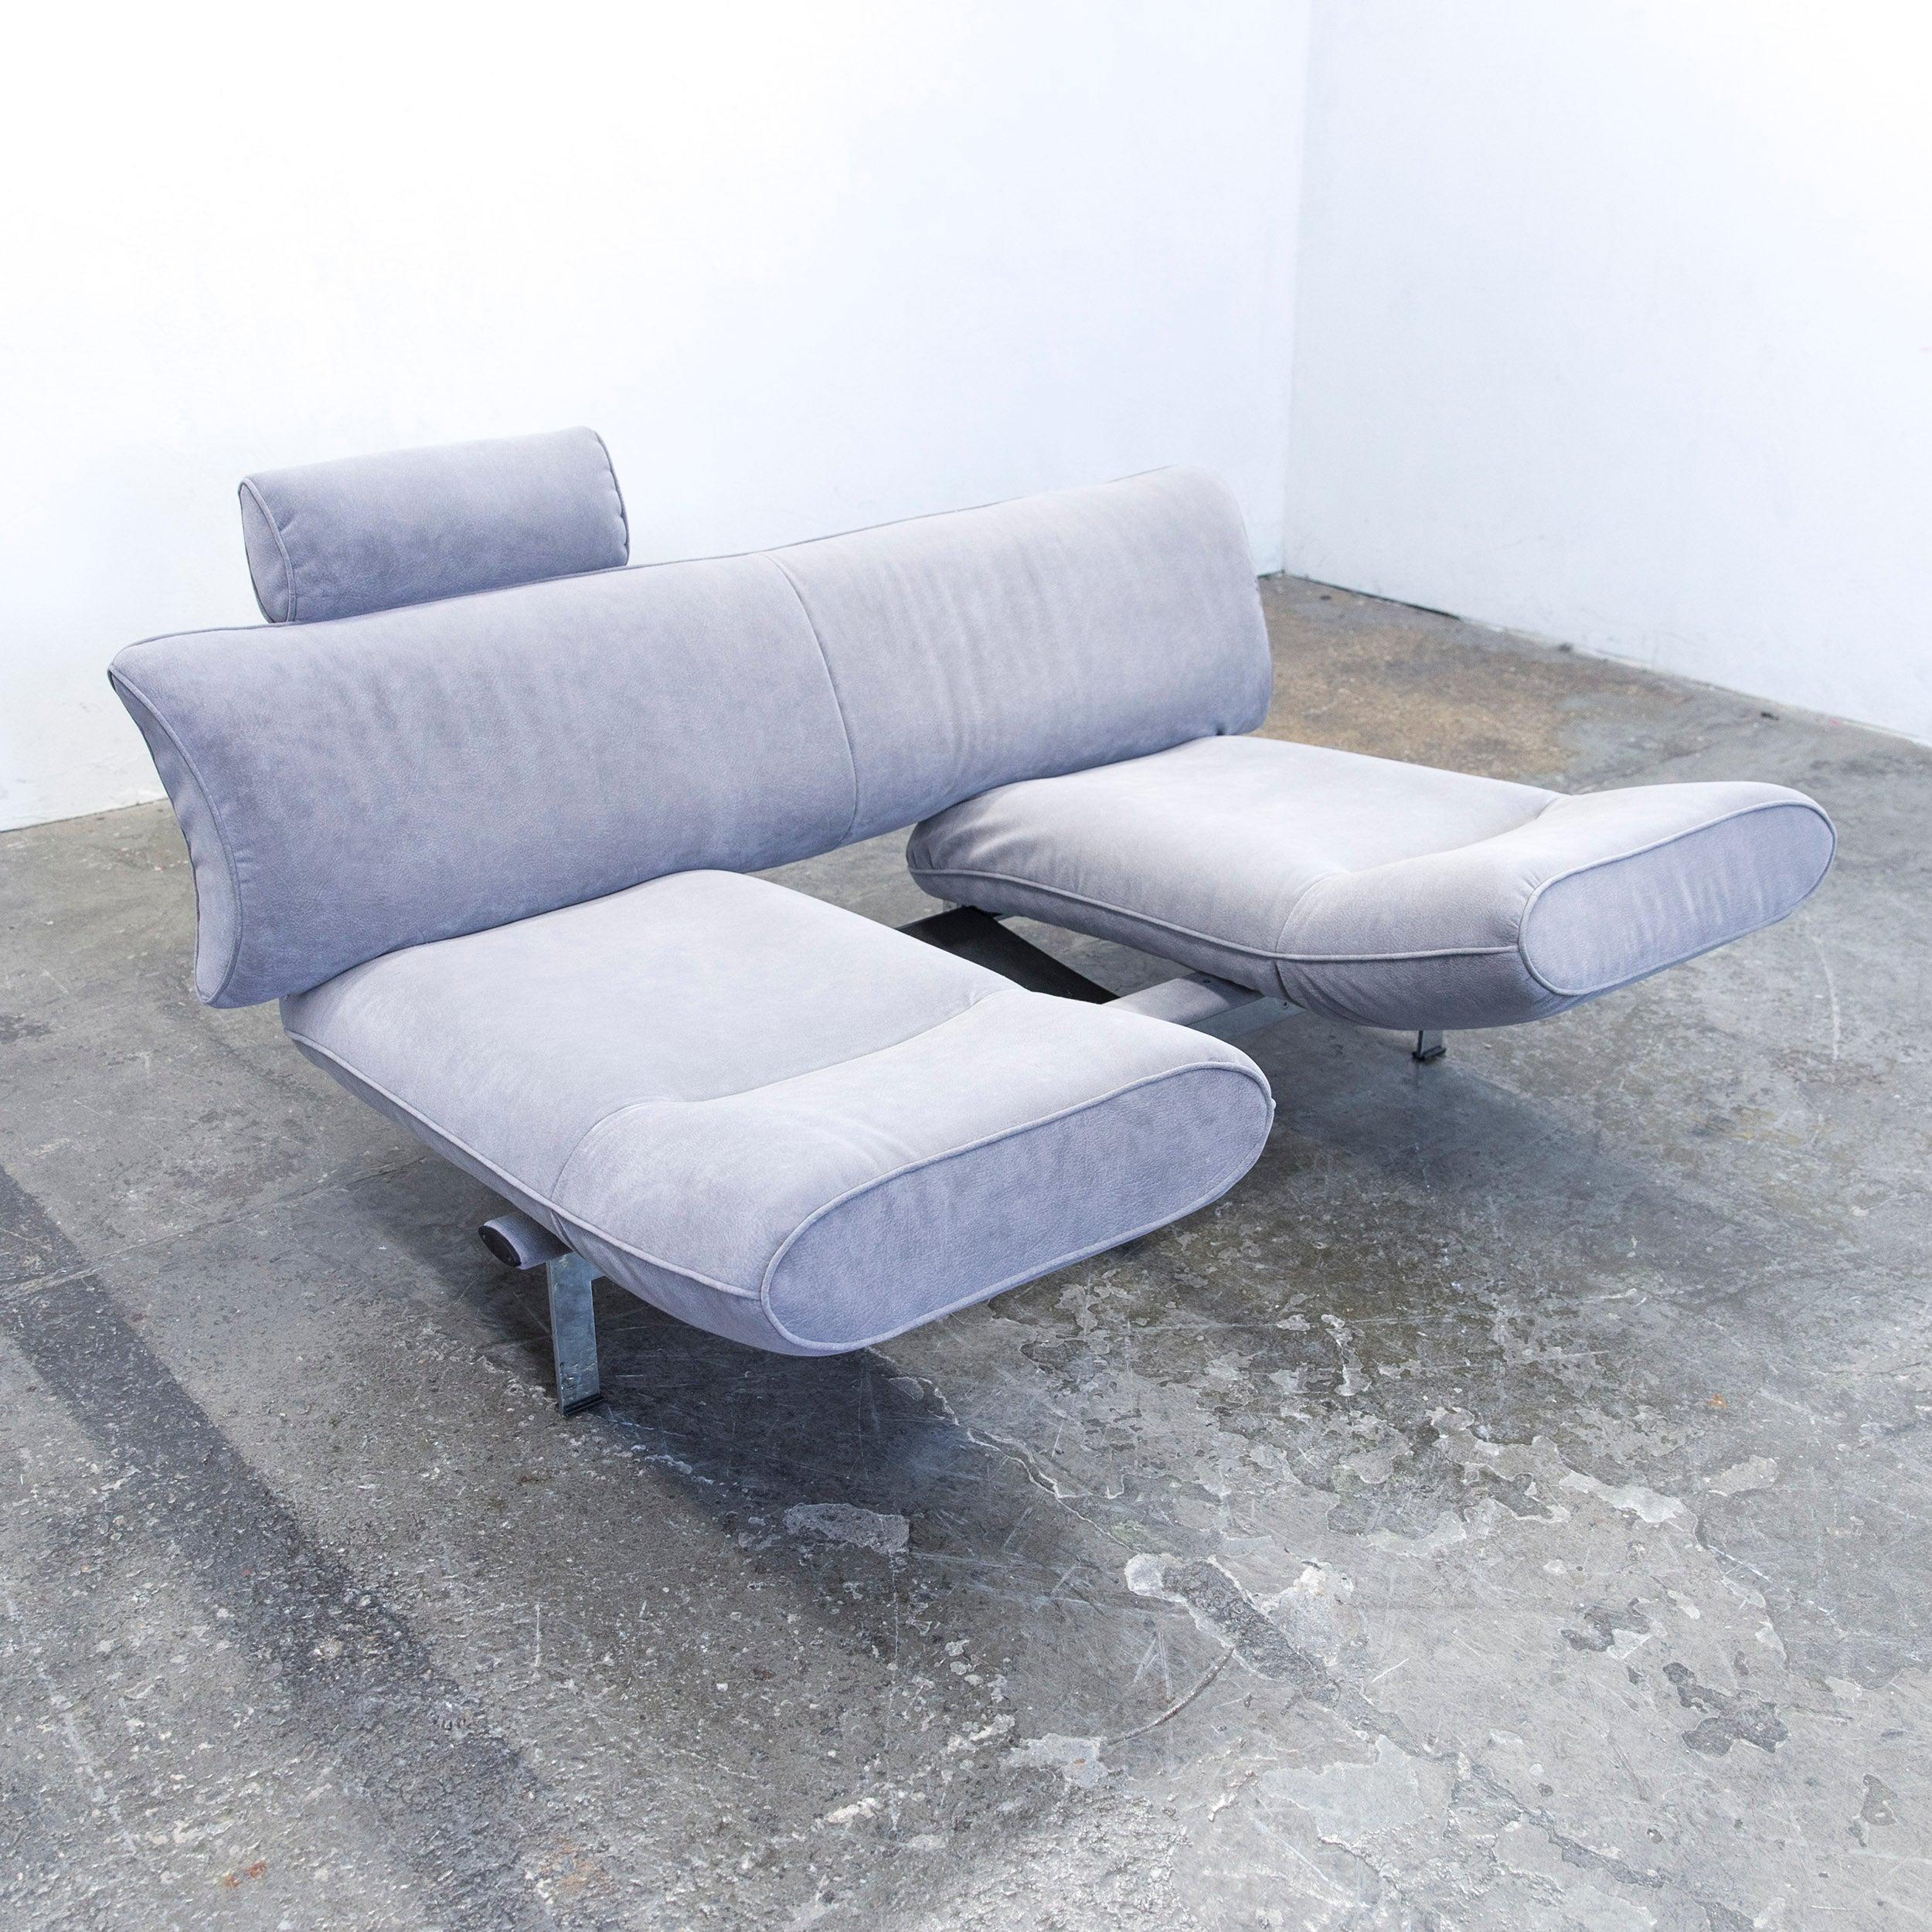 Großzügig Tremendous Sessel Vintage Fotos - Heimat Ideen ...